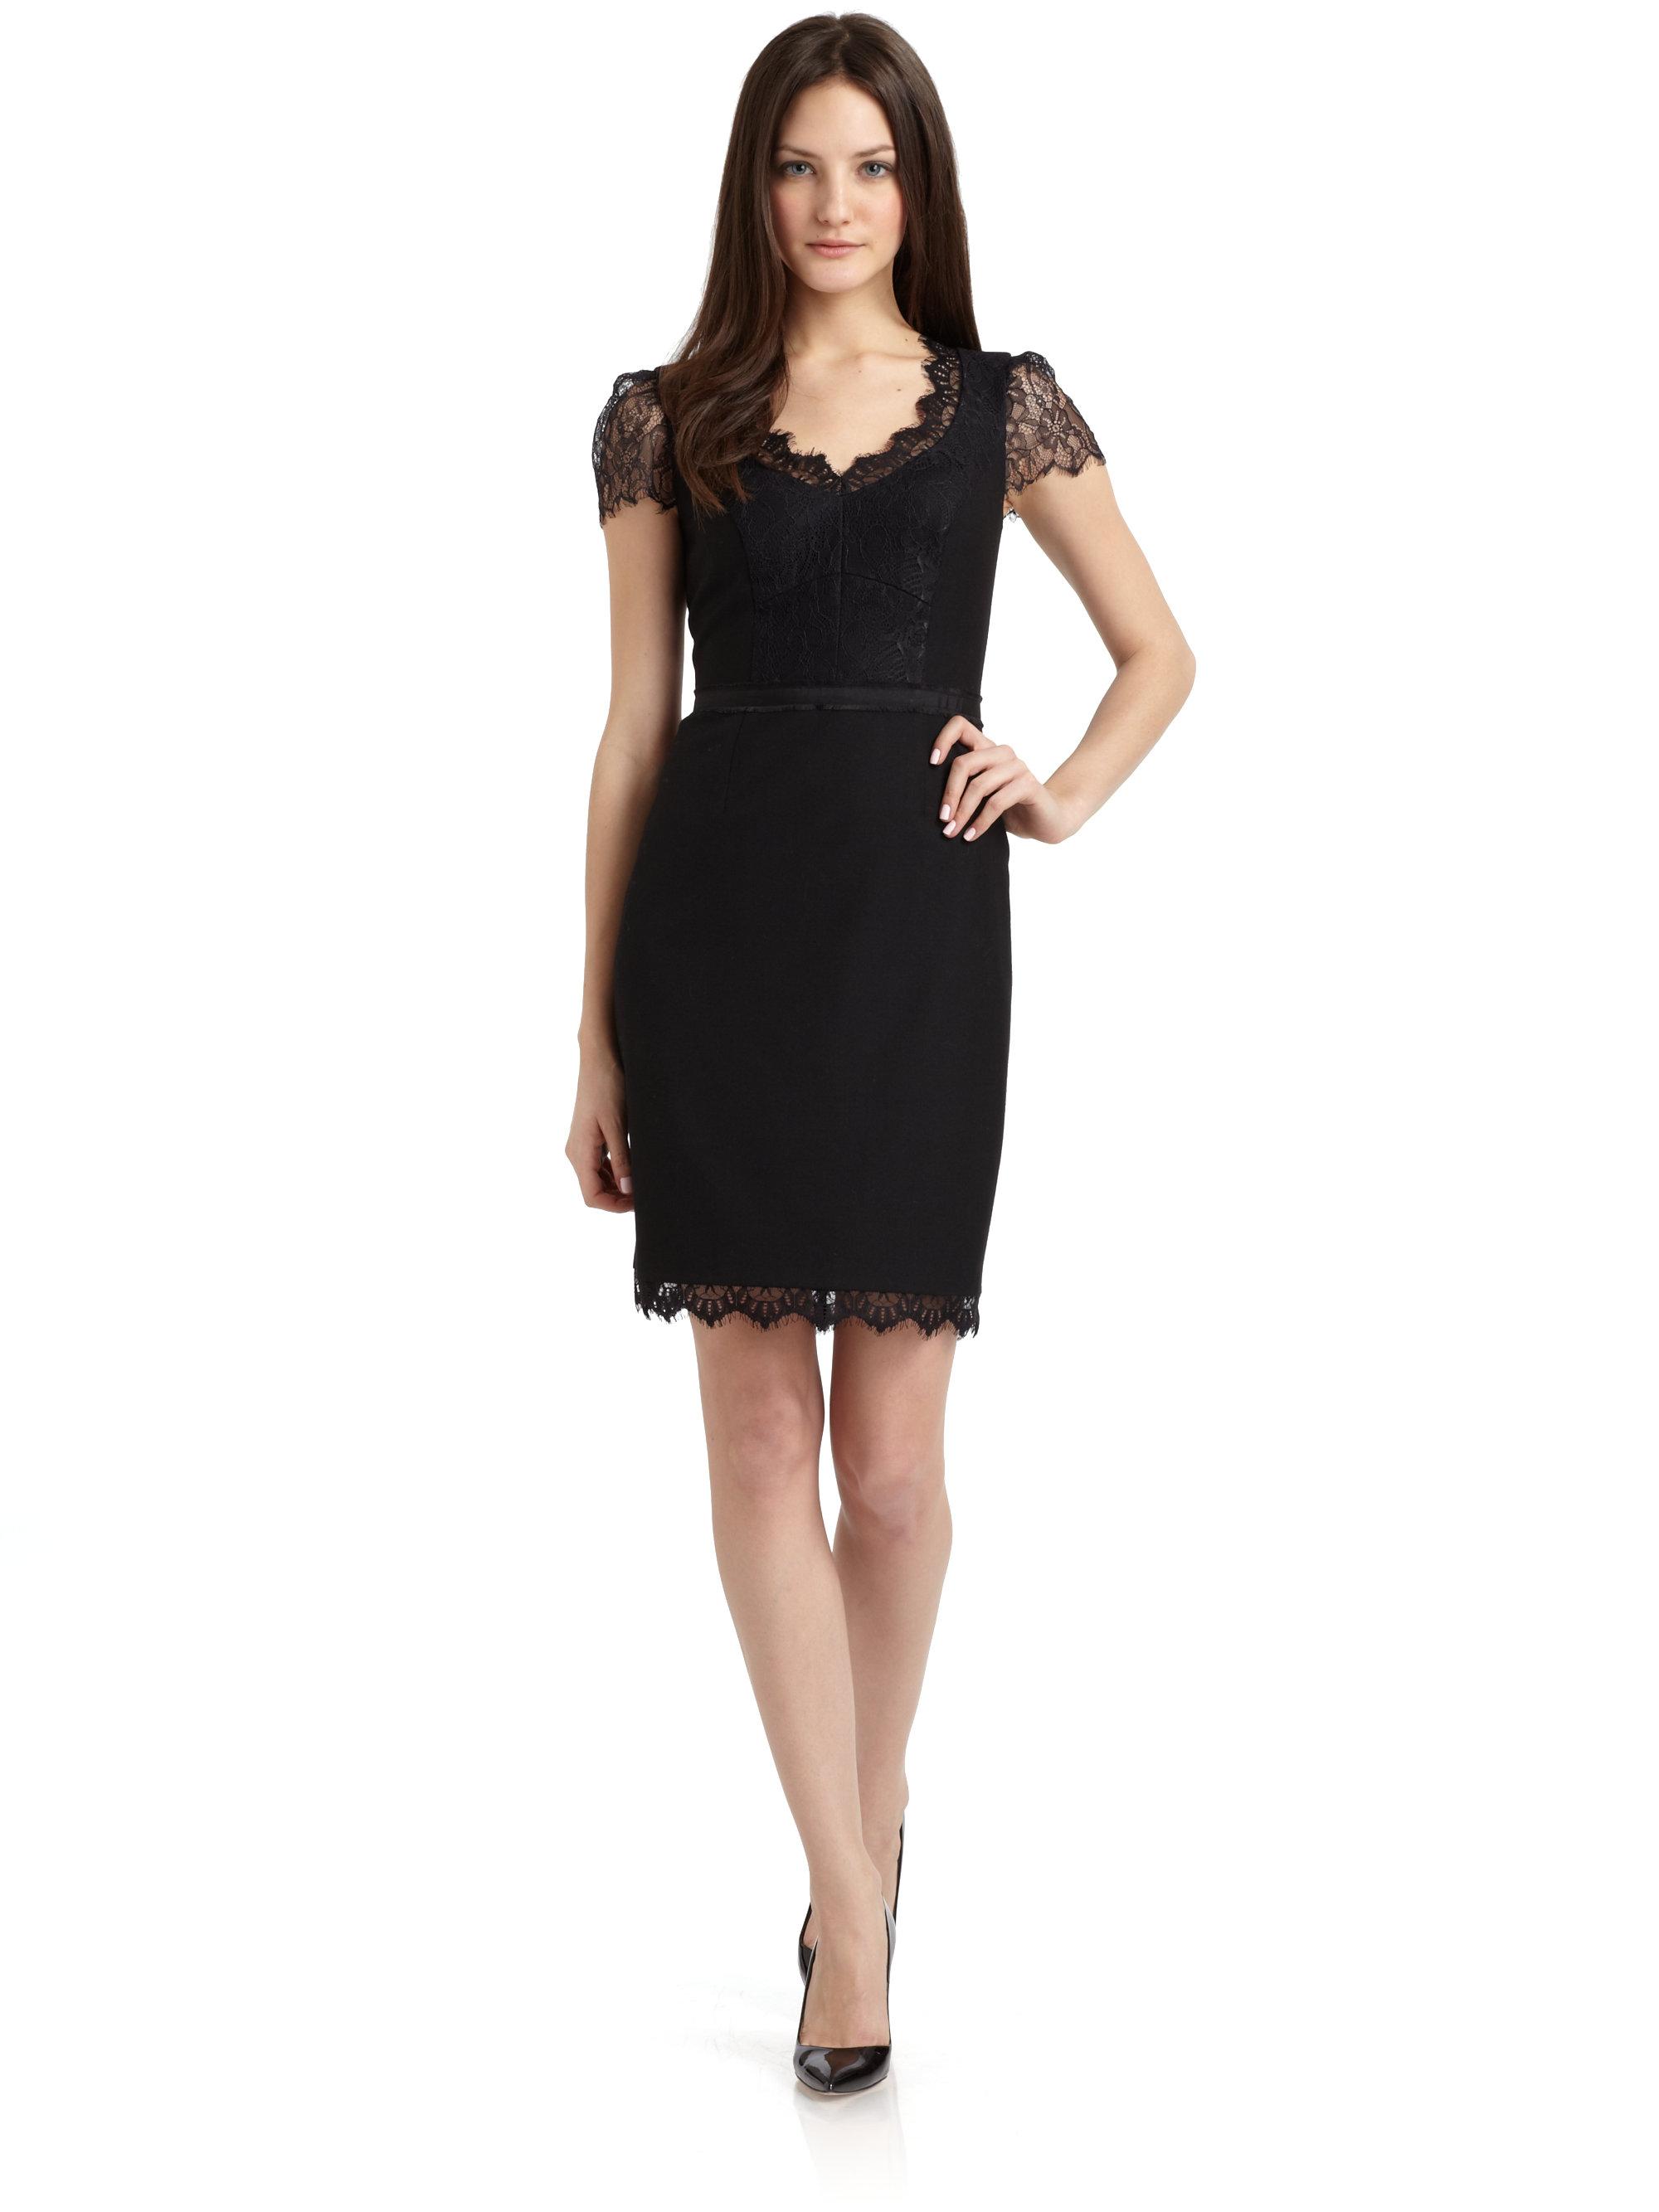 Black Dress with Cap Sleeves